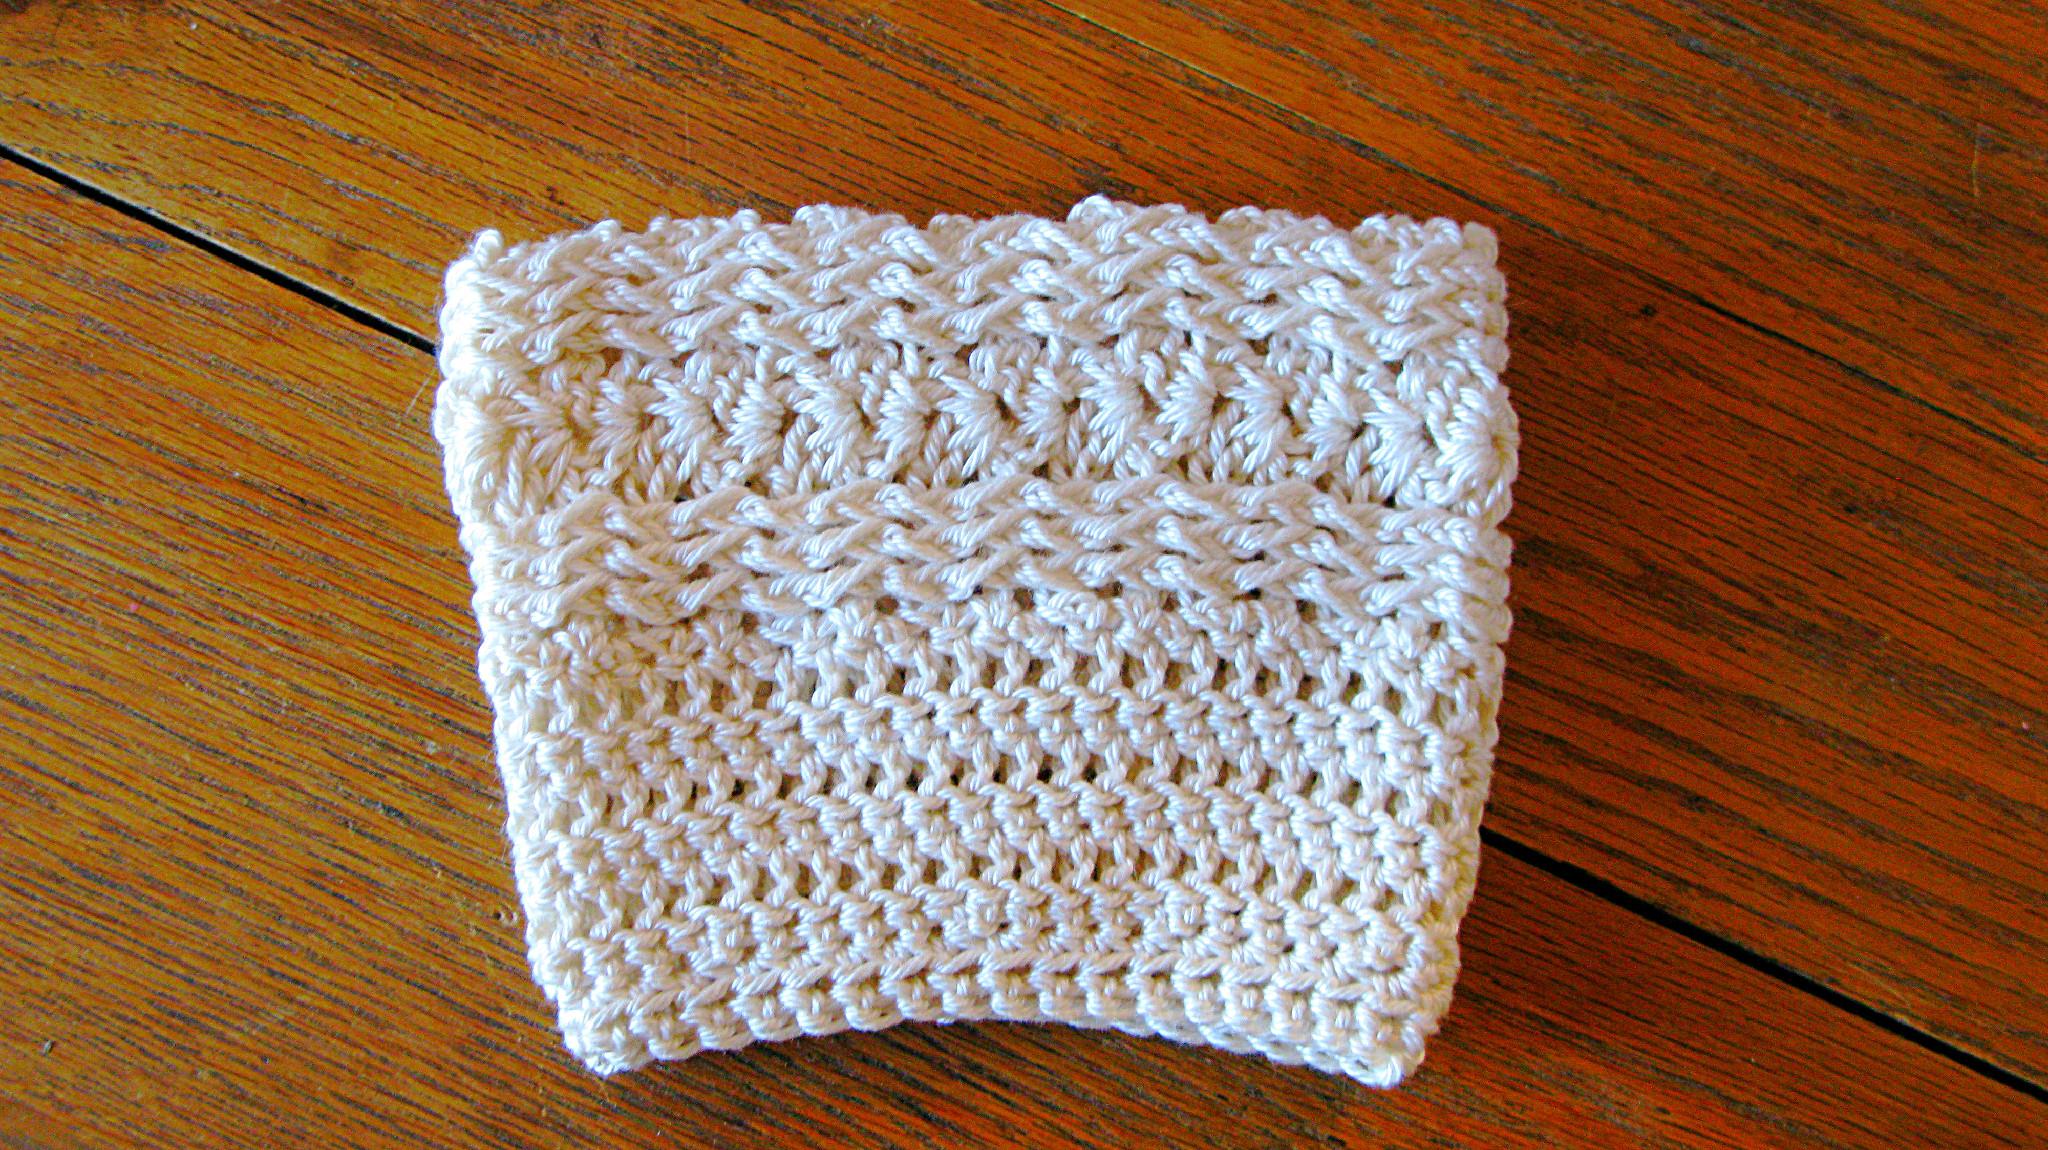 Free Crochet Pattern Of Boot Cuffs : Free Waves and Seashells Boot Cuff Pattern ELK Studio ...